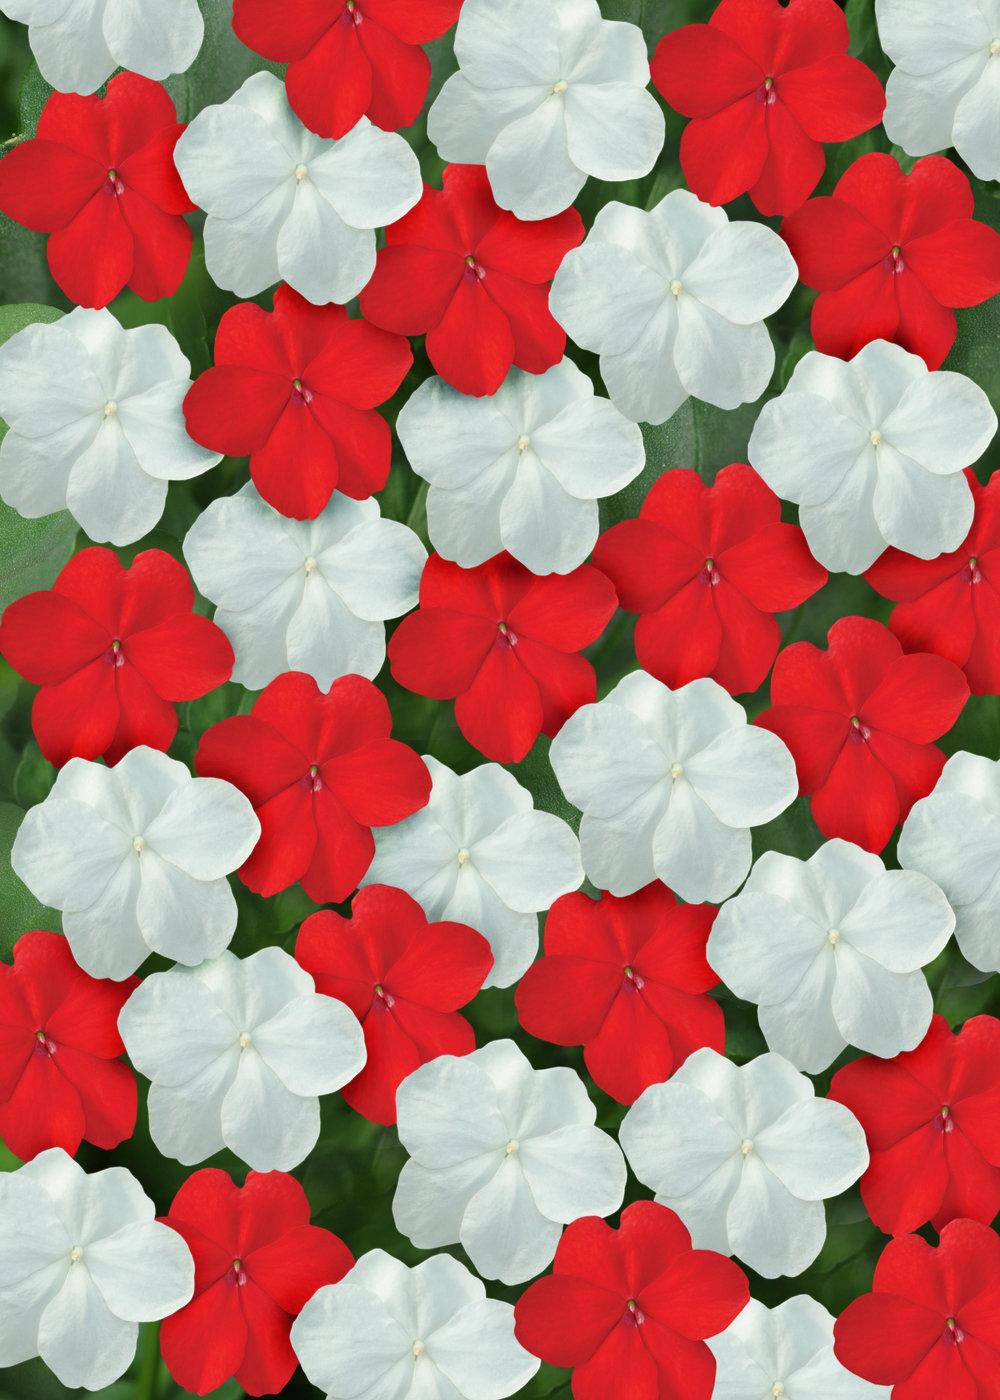 Impatiens Super Elfin Red White Mix